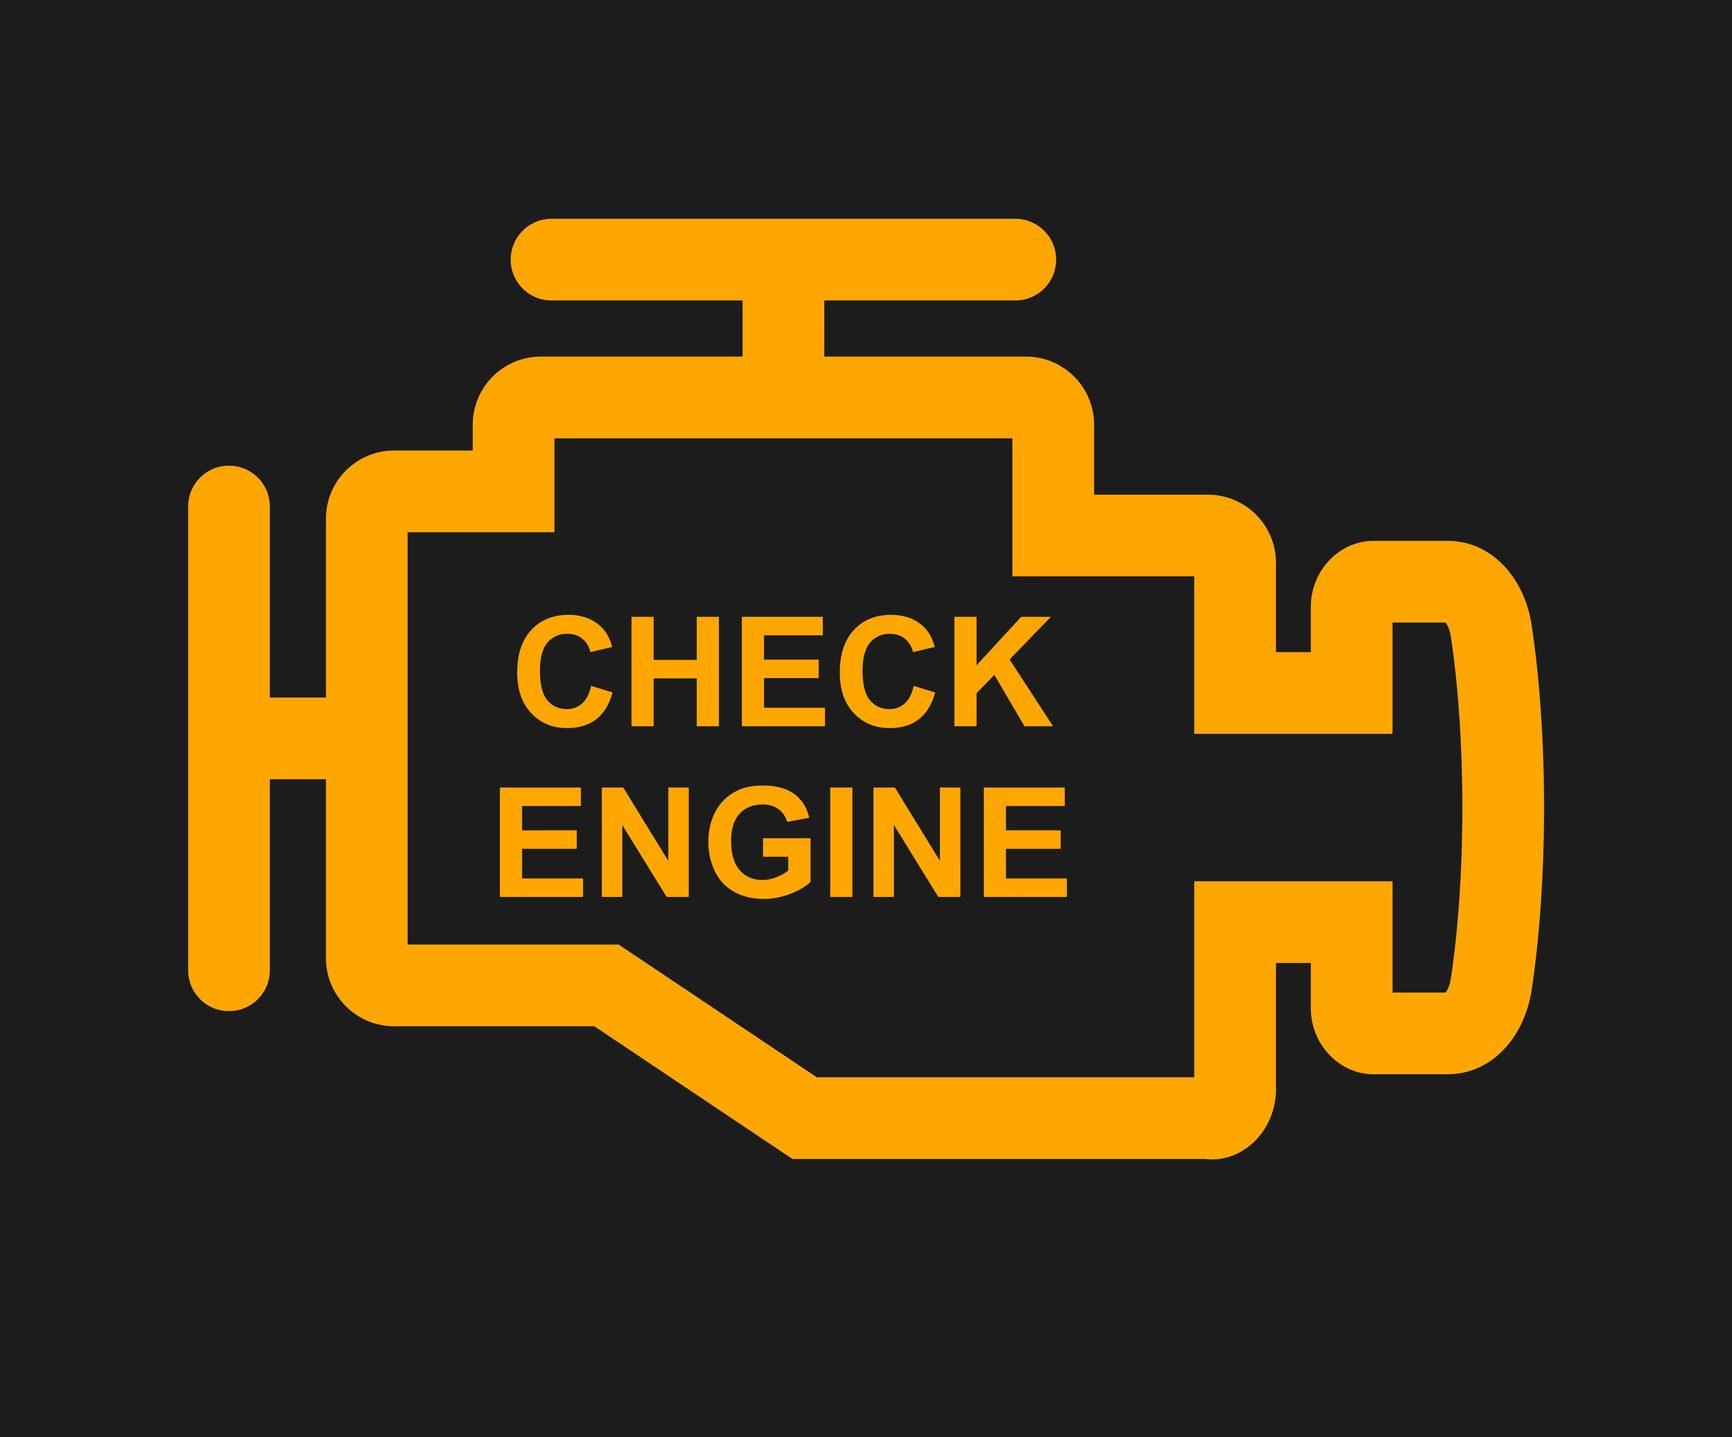 Yellow and black check engine light logo